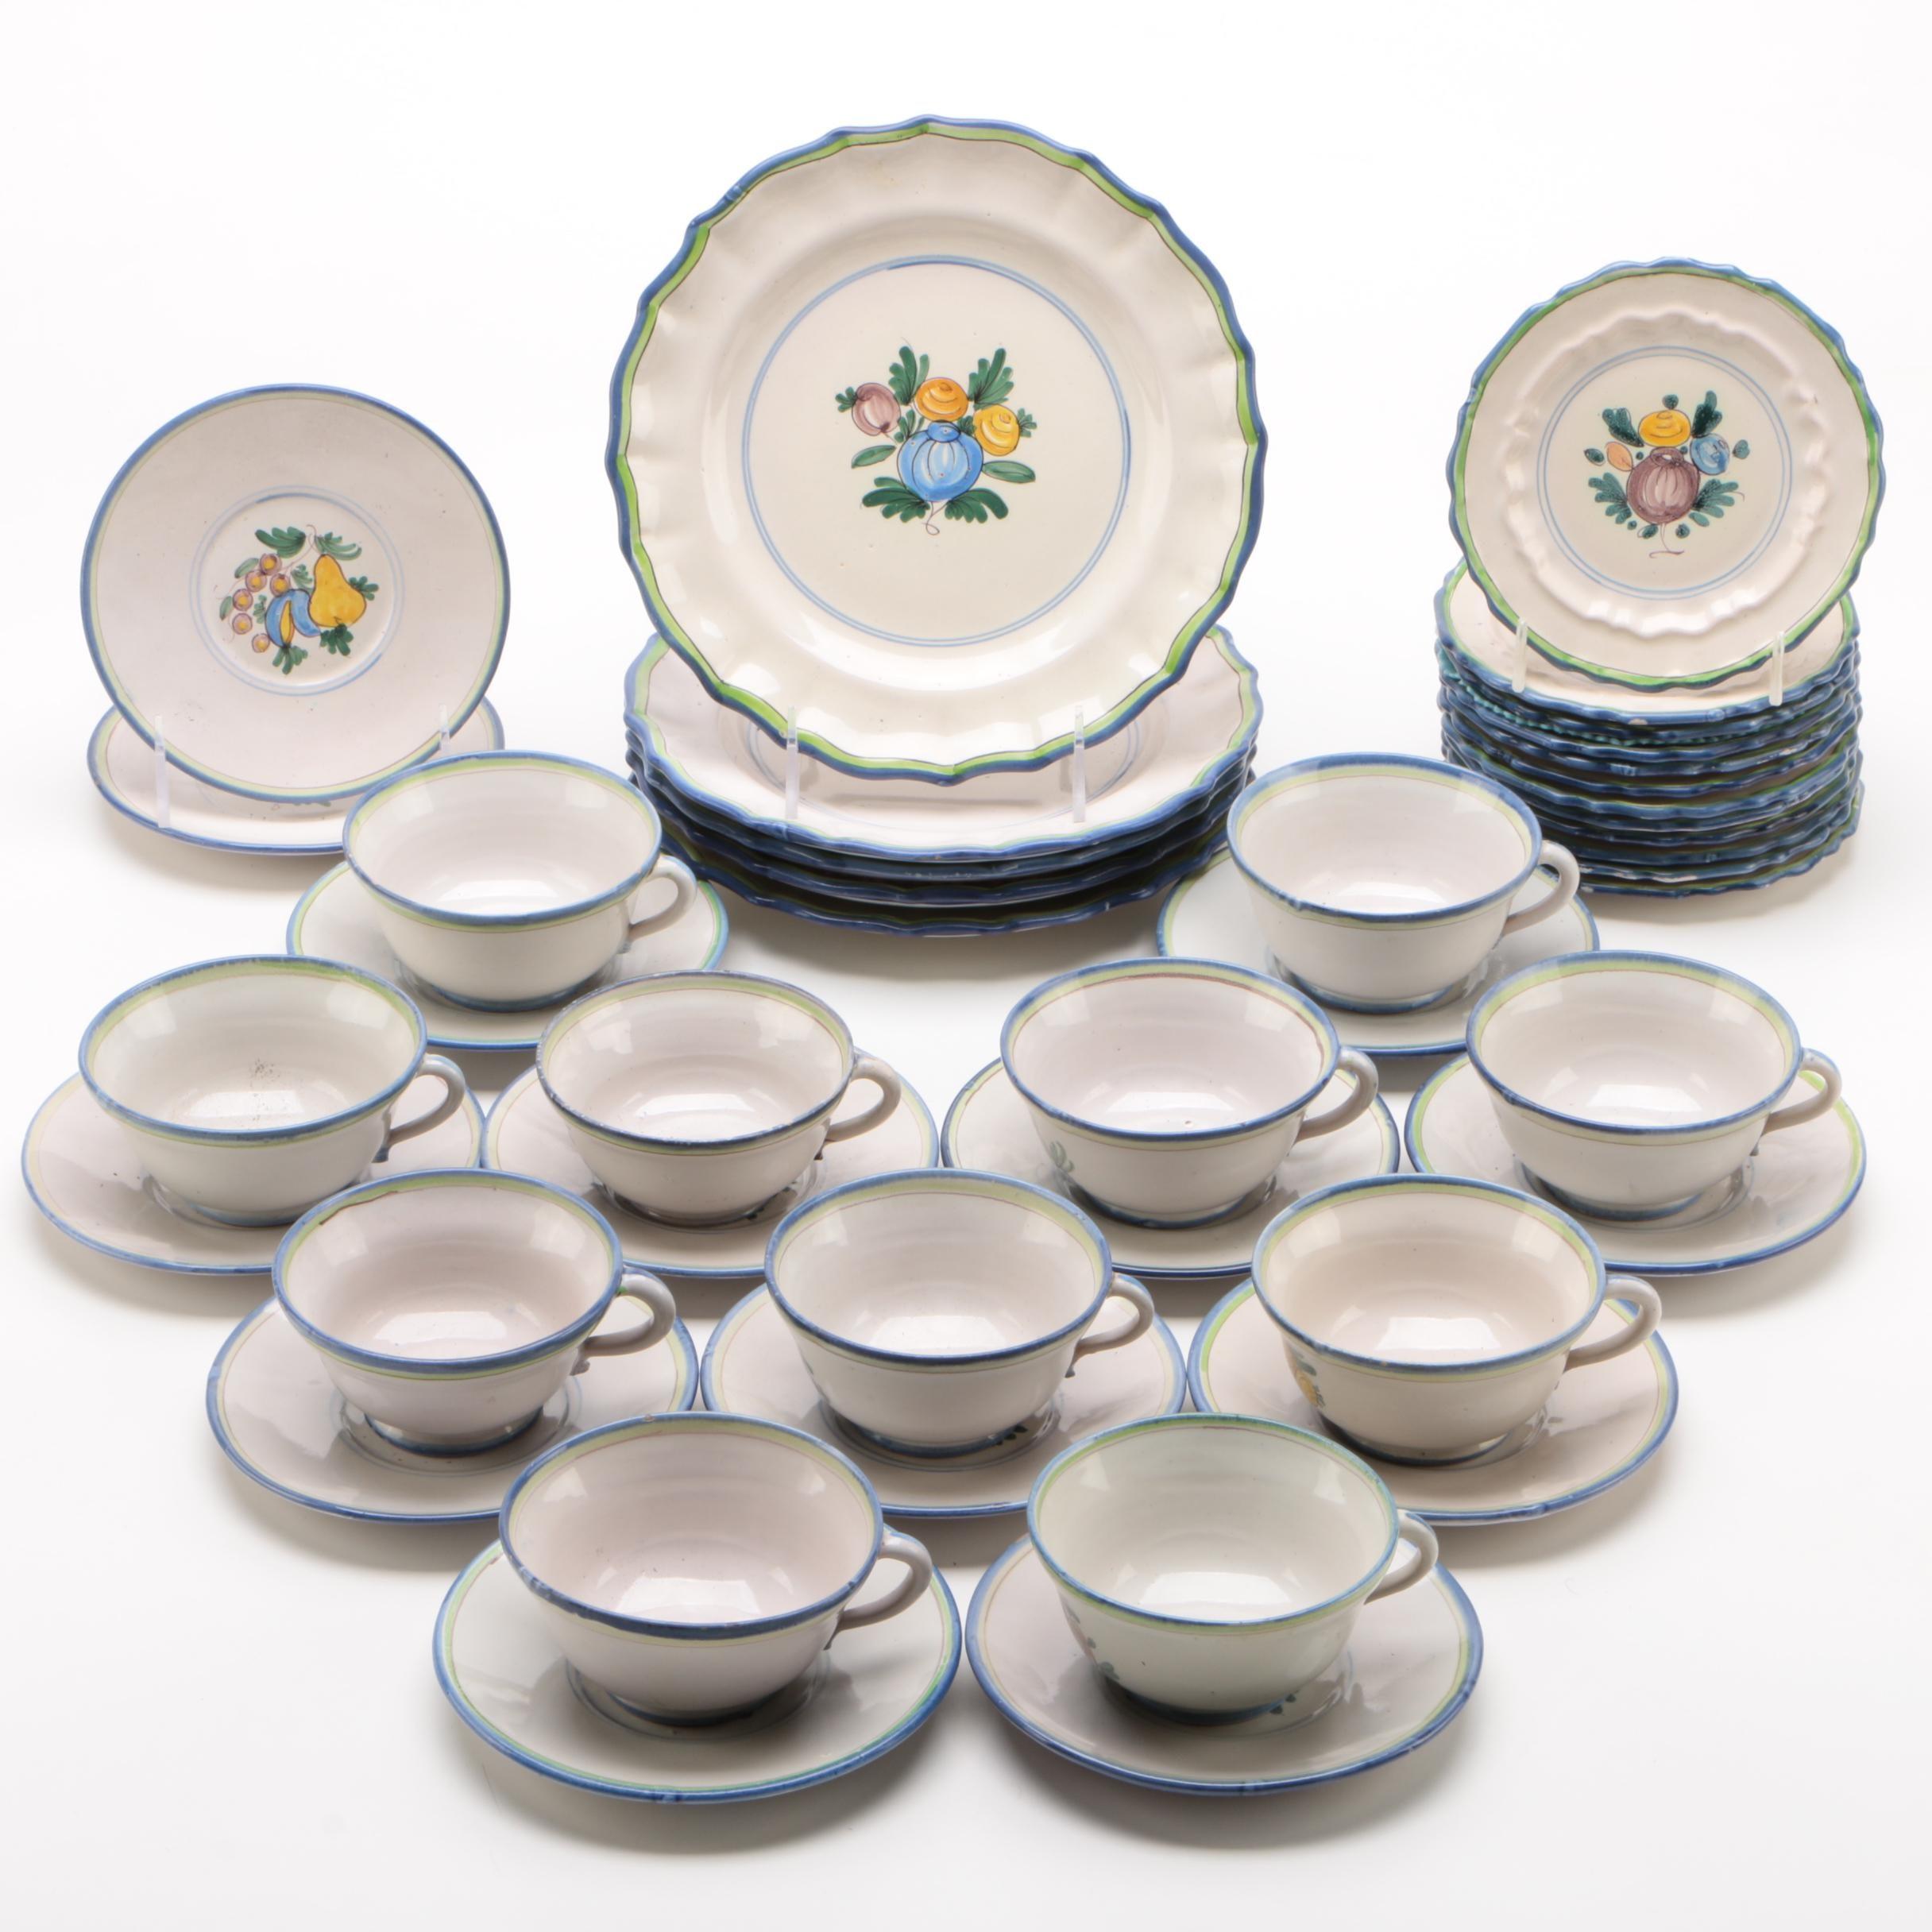 Cantagalli Italian Maiolica Dinnerware Pieces with Fruit Motif, Mid-Century